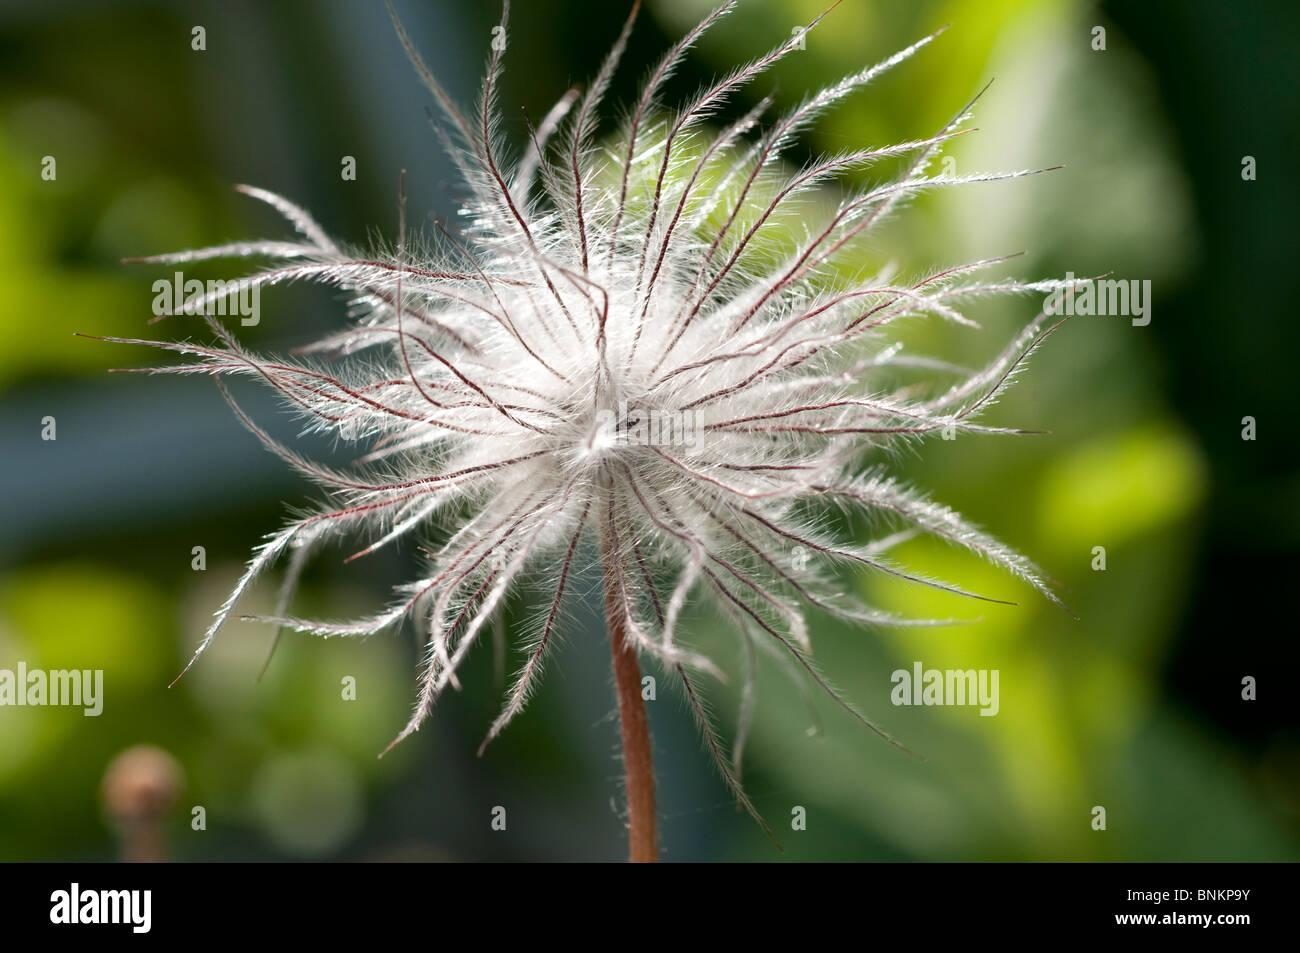 Pulsatilla vulgaris Pasqueflower Seed head Fruit of Pulsatilla alpina - Stock Image